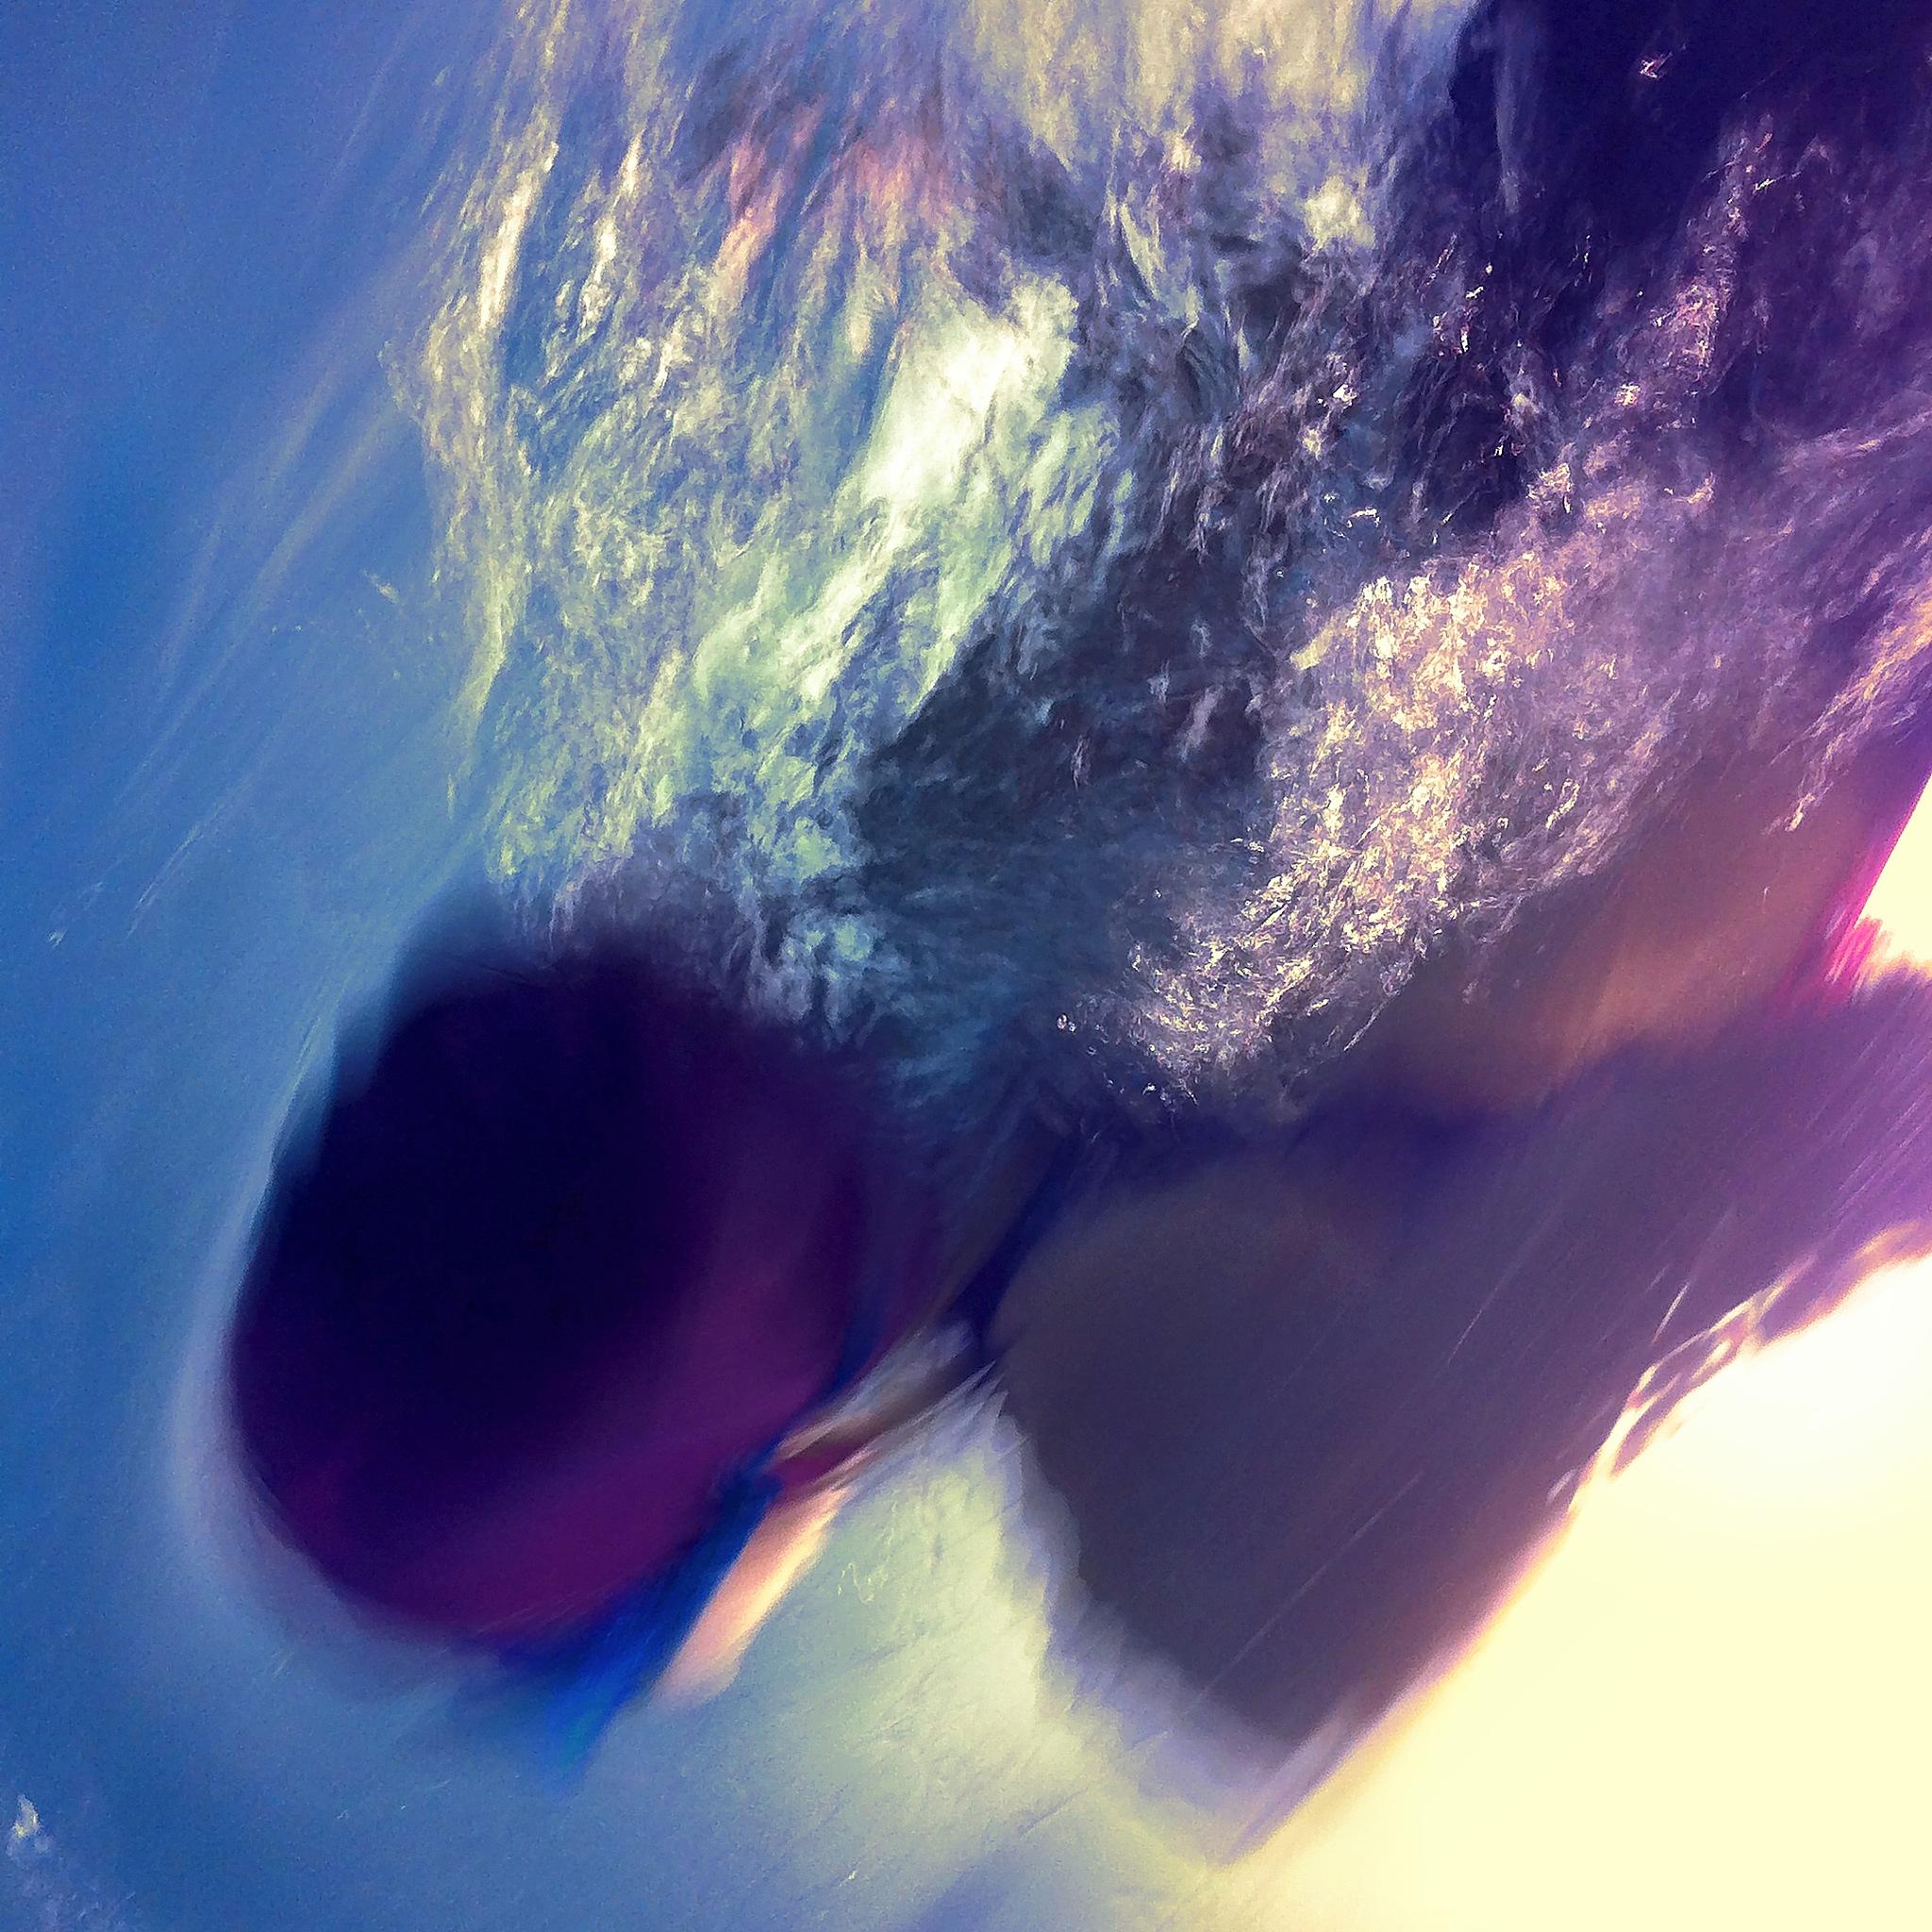 Small suits swim by Daniel Ljunggren